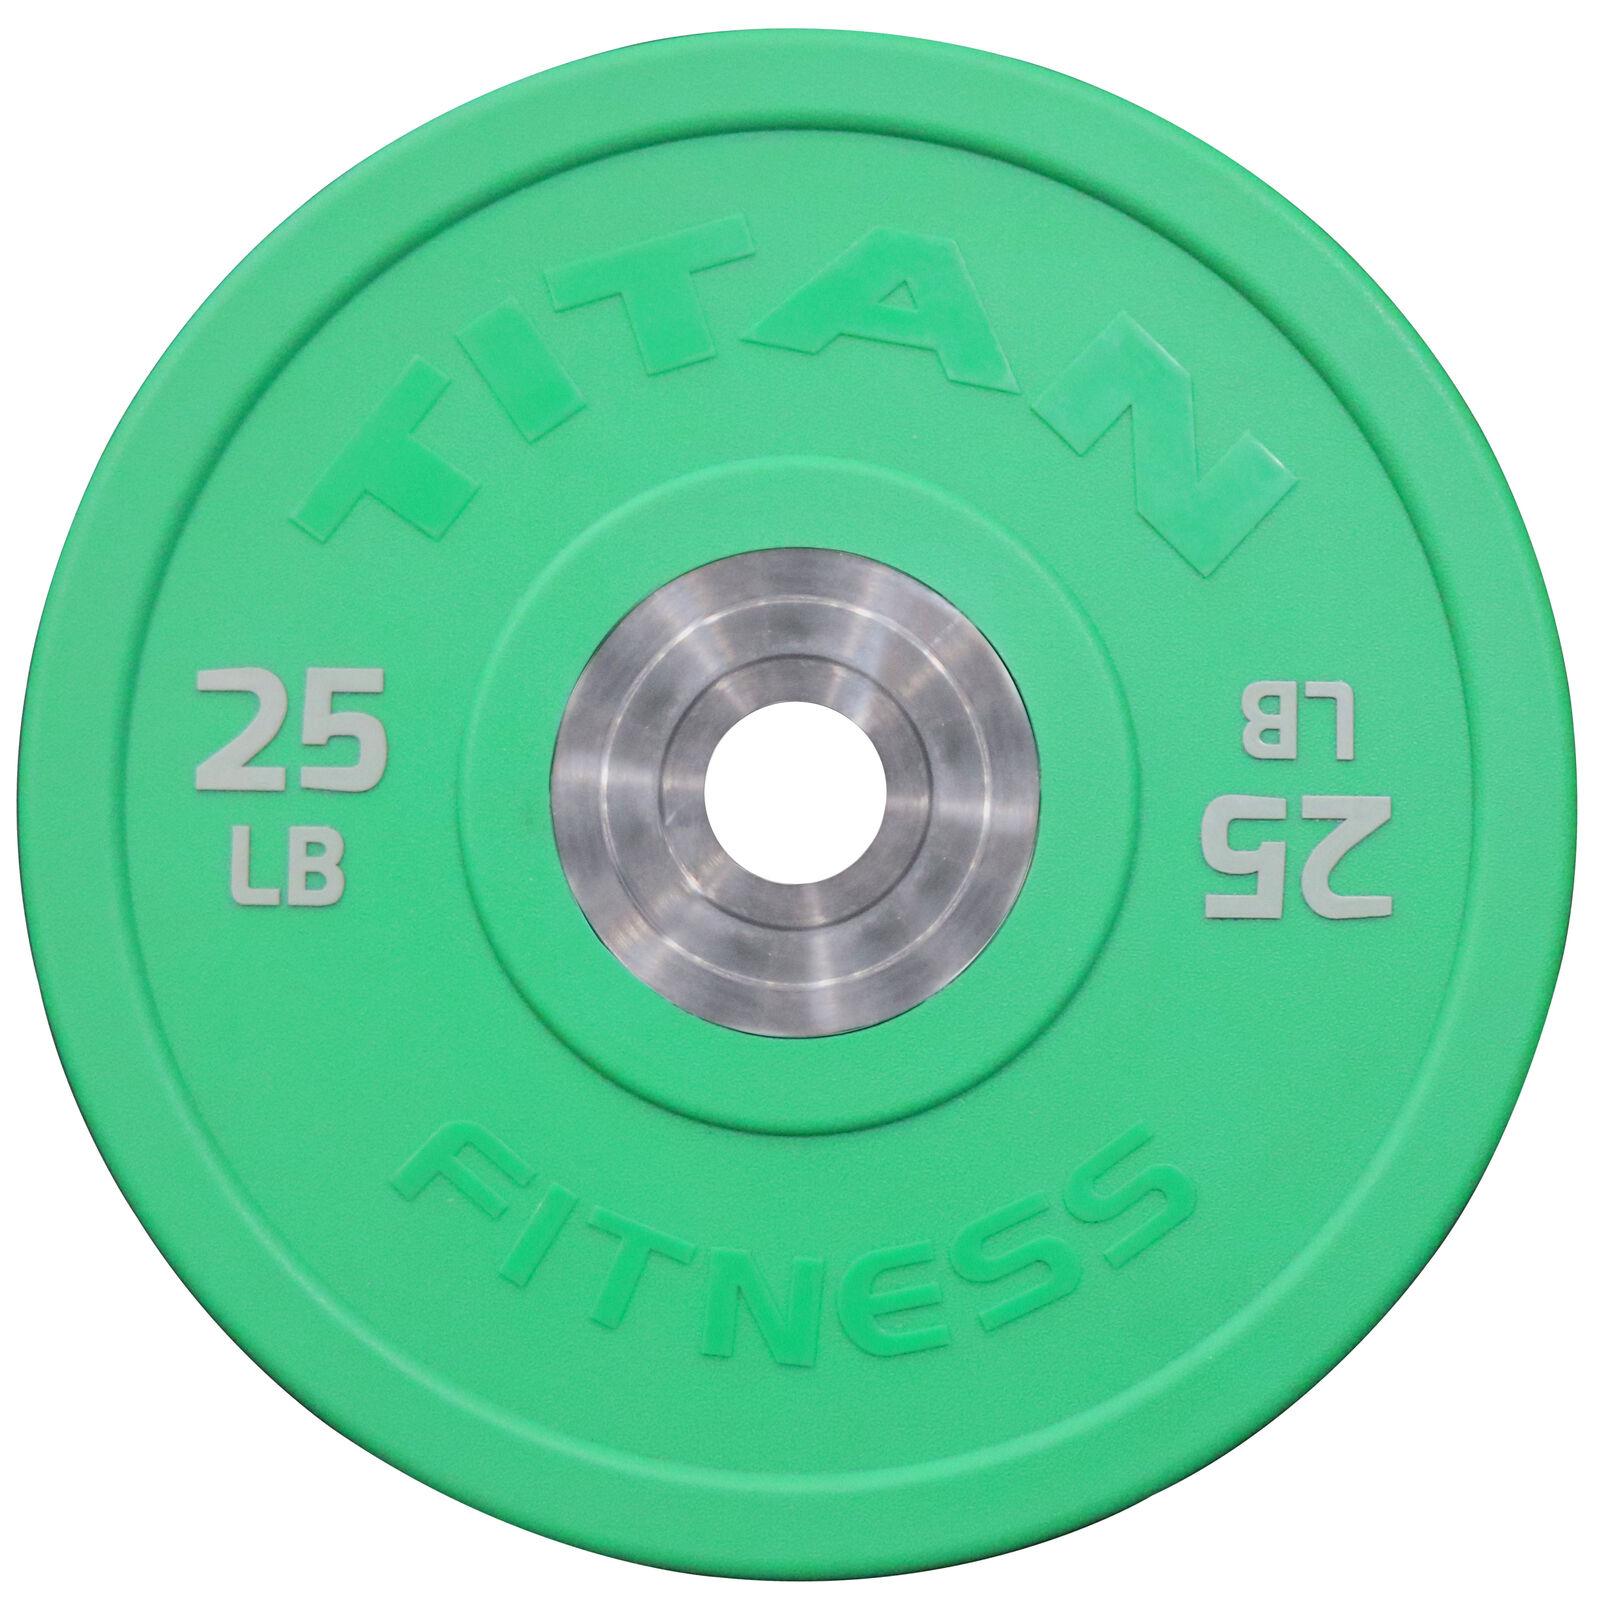 Titan Urethane Bumper Plates   color   25 LB Single